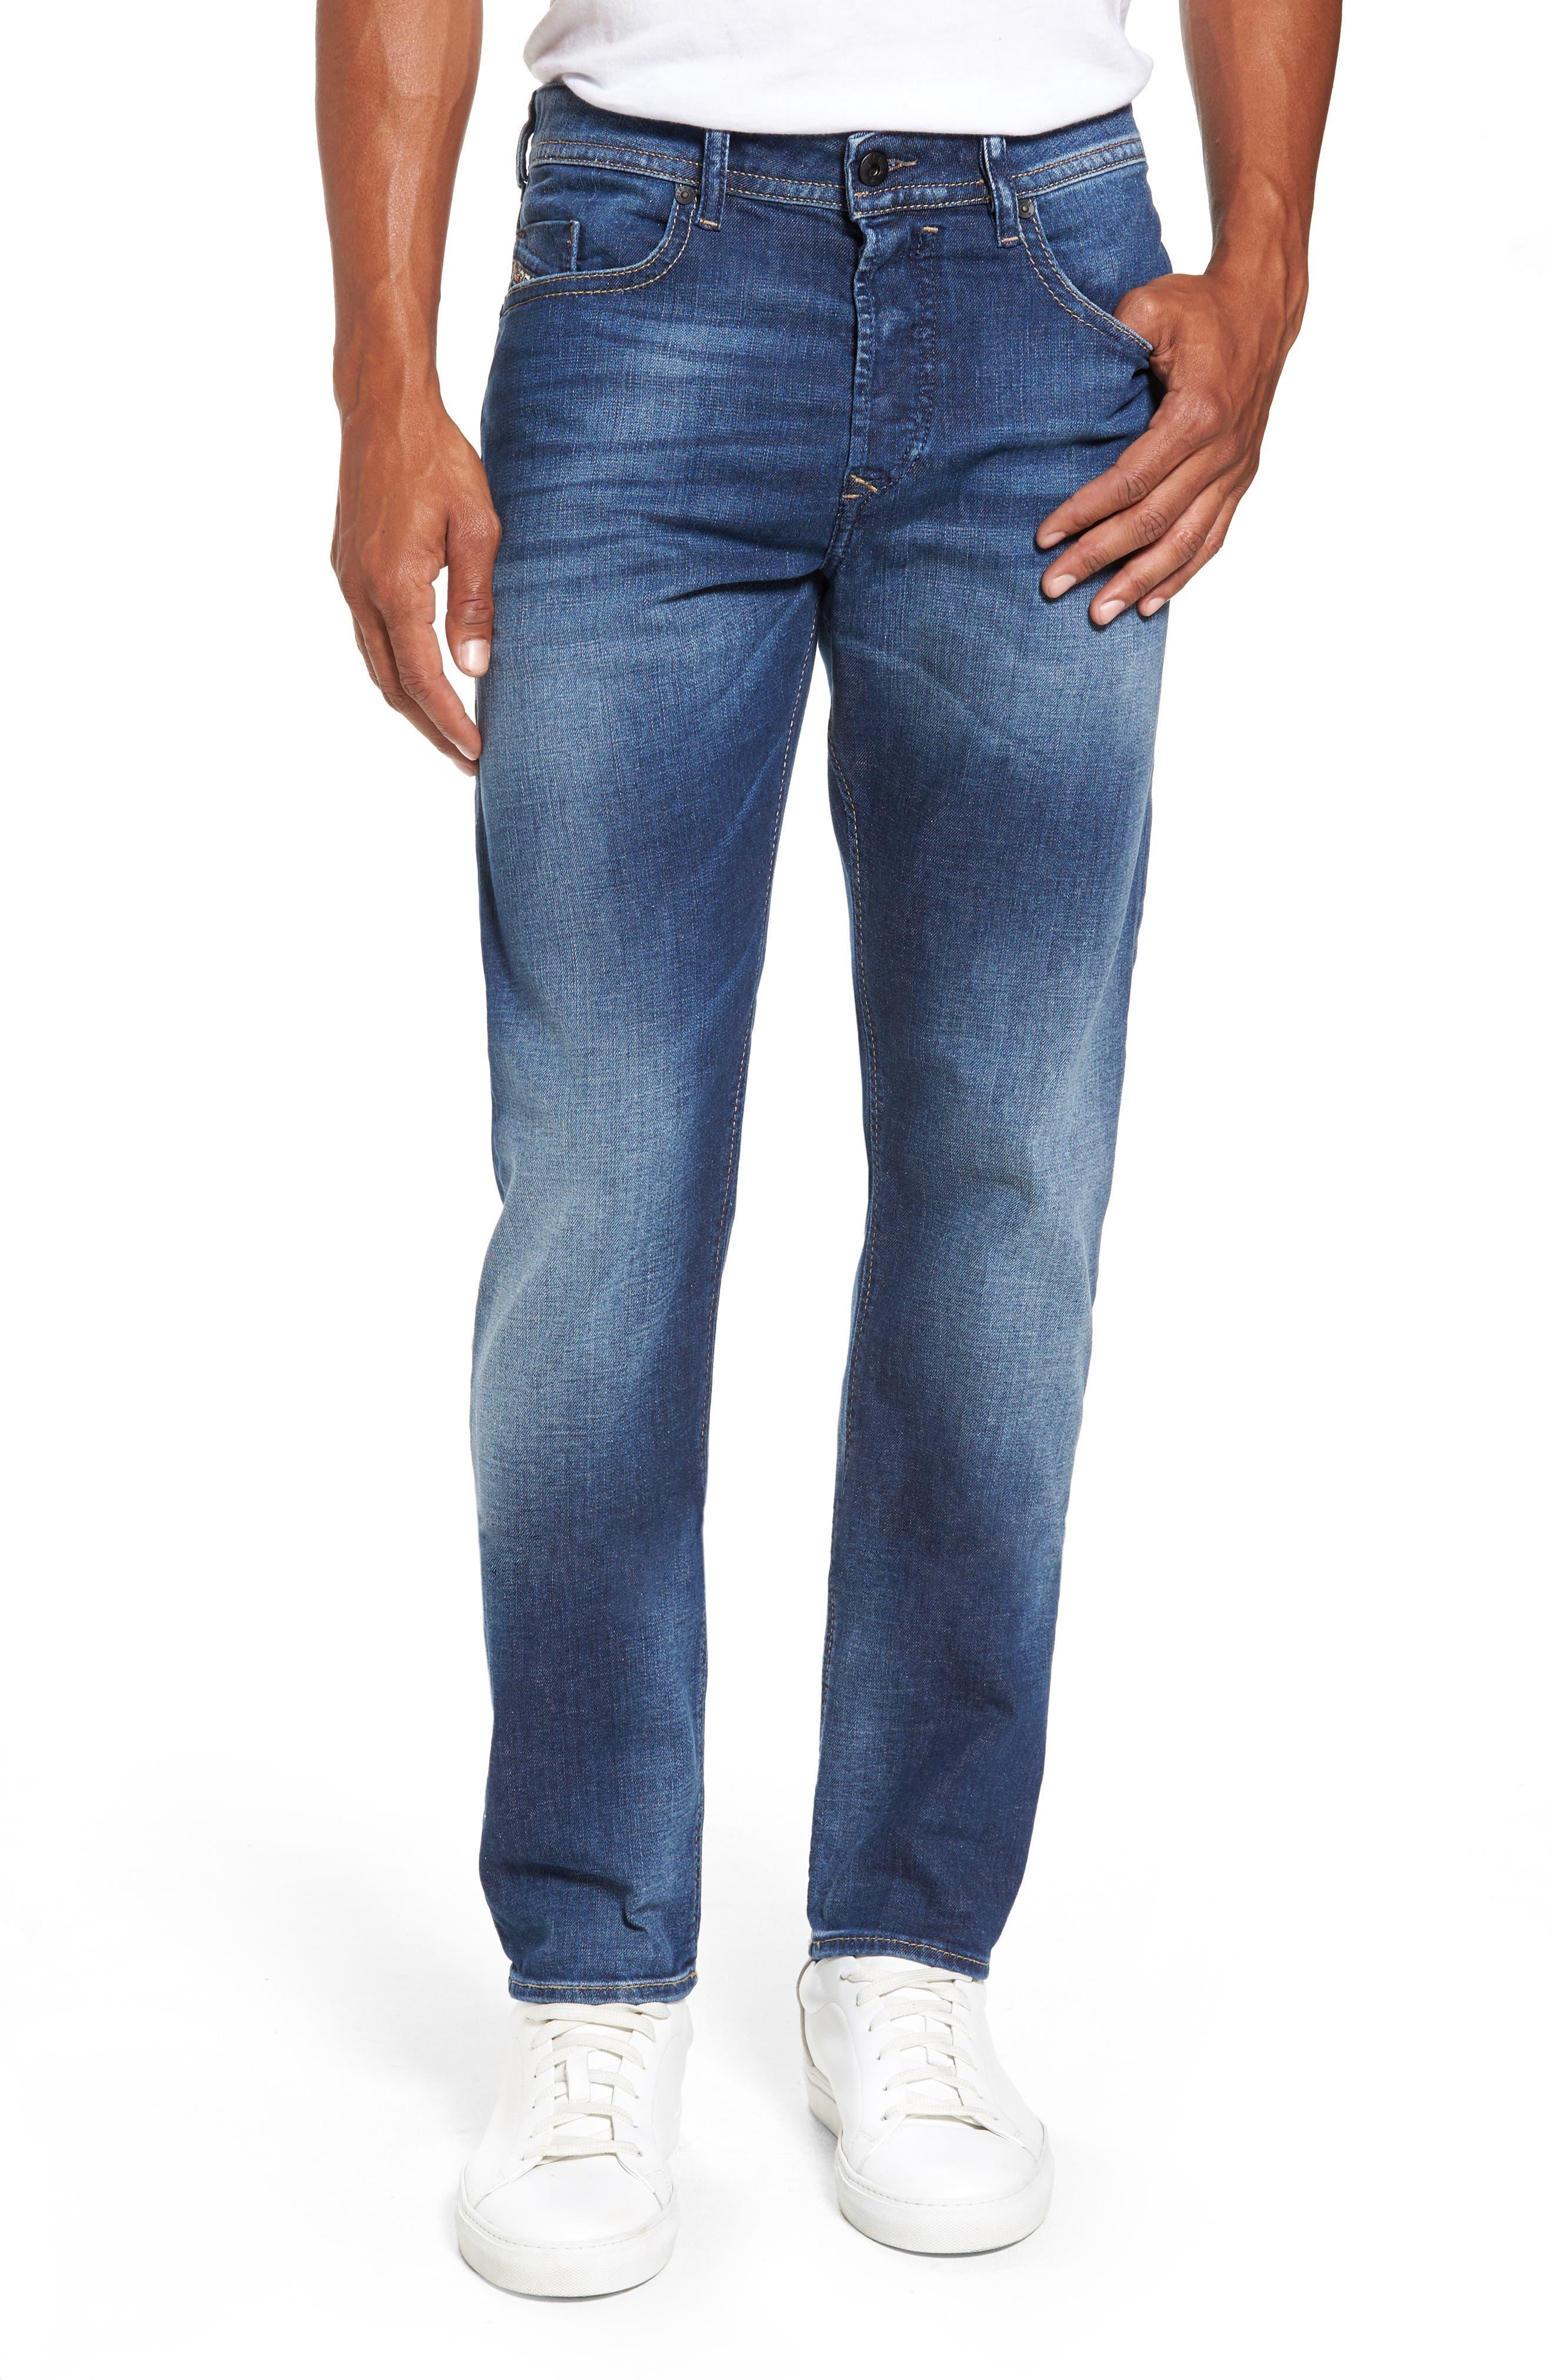 Buster Slim Straight Leg Jeans,                             Main thumbnail 1, color,                             400